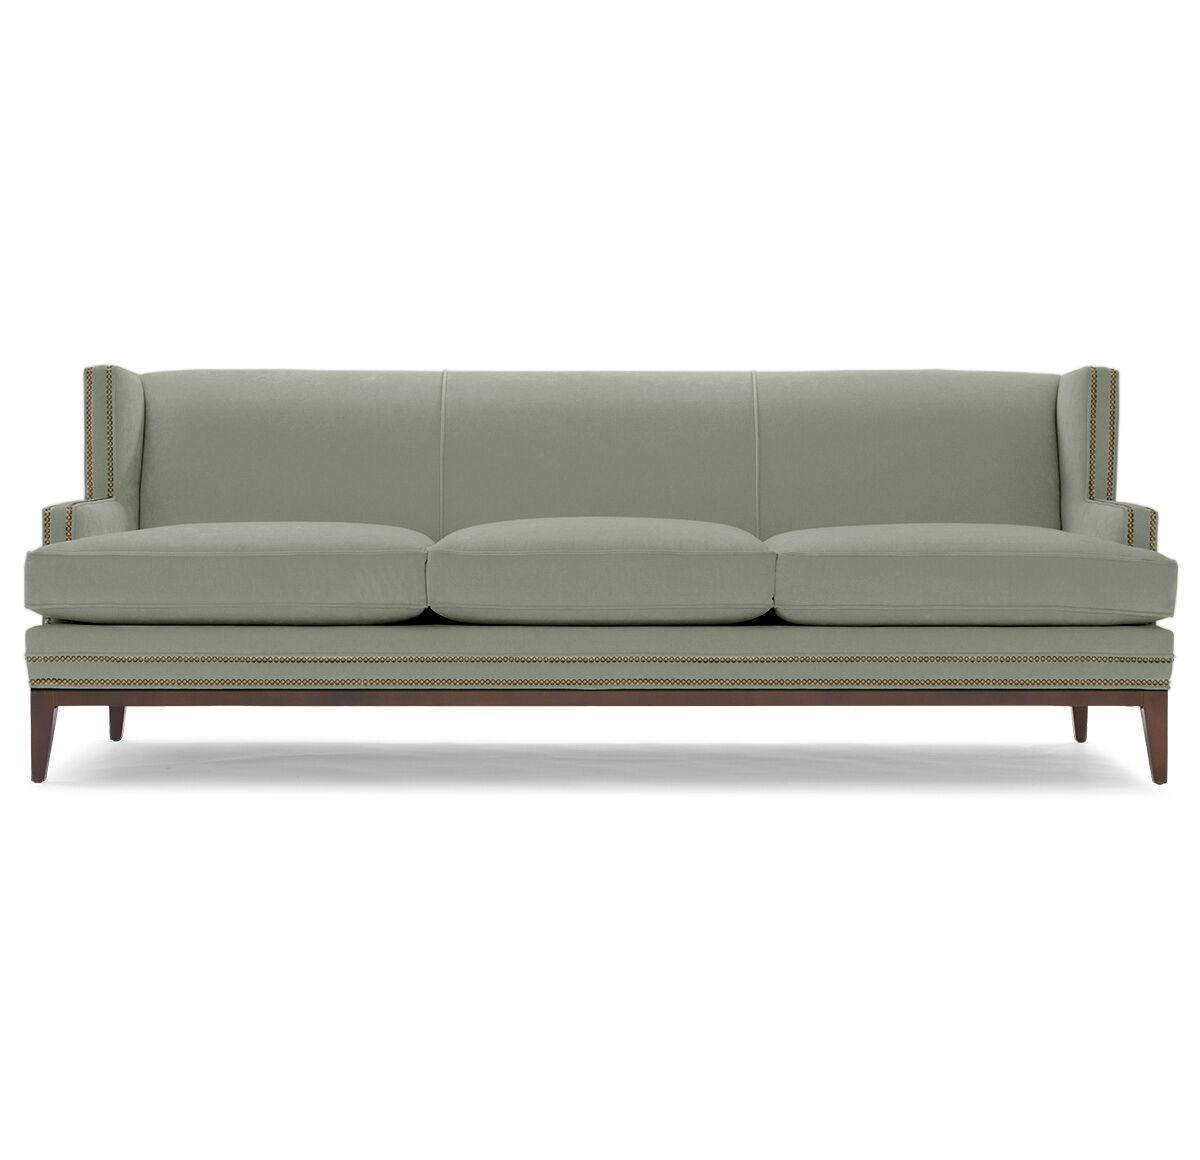 mitc gold and bob williams sofa recliner covers ikea mgbw – thesofa